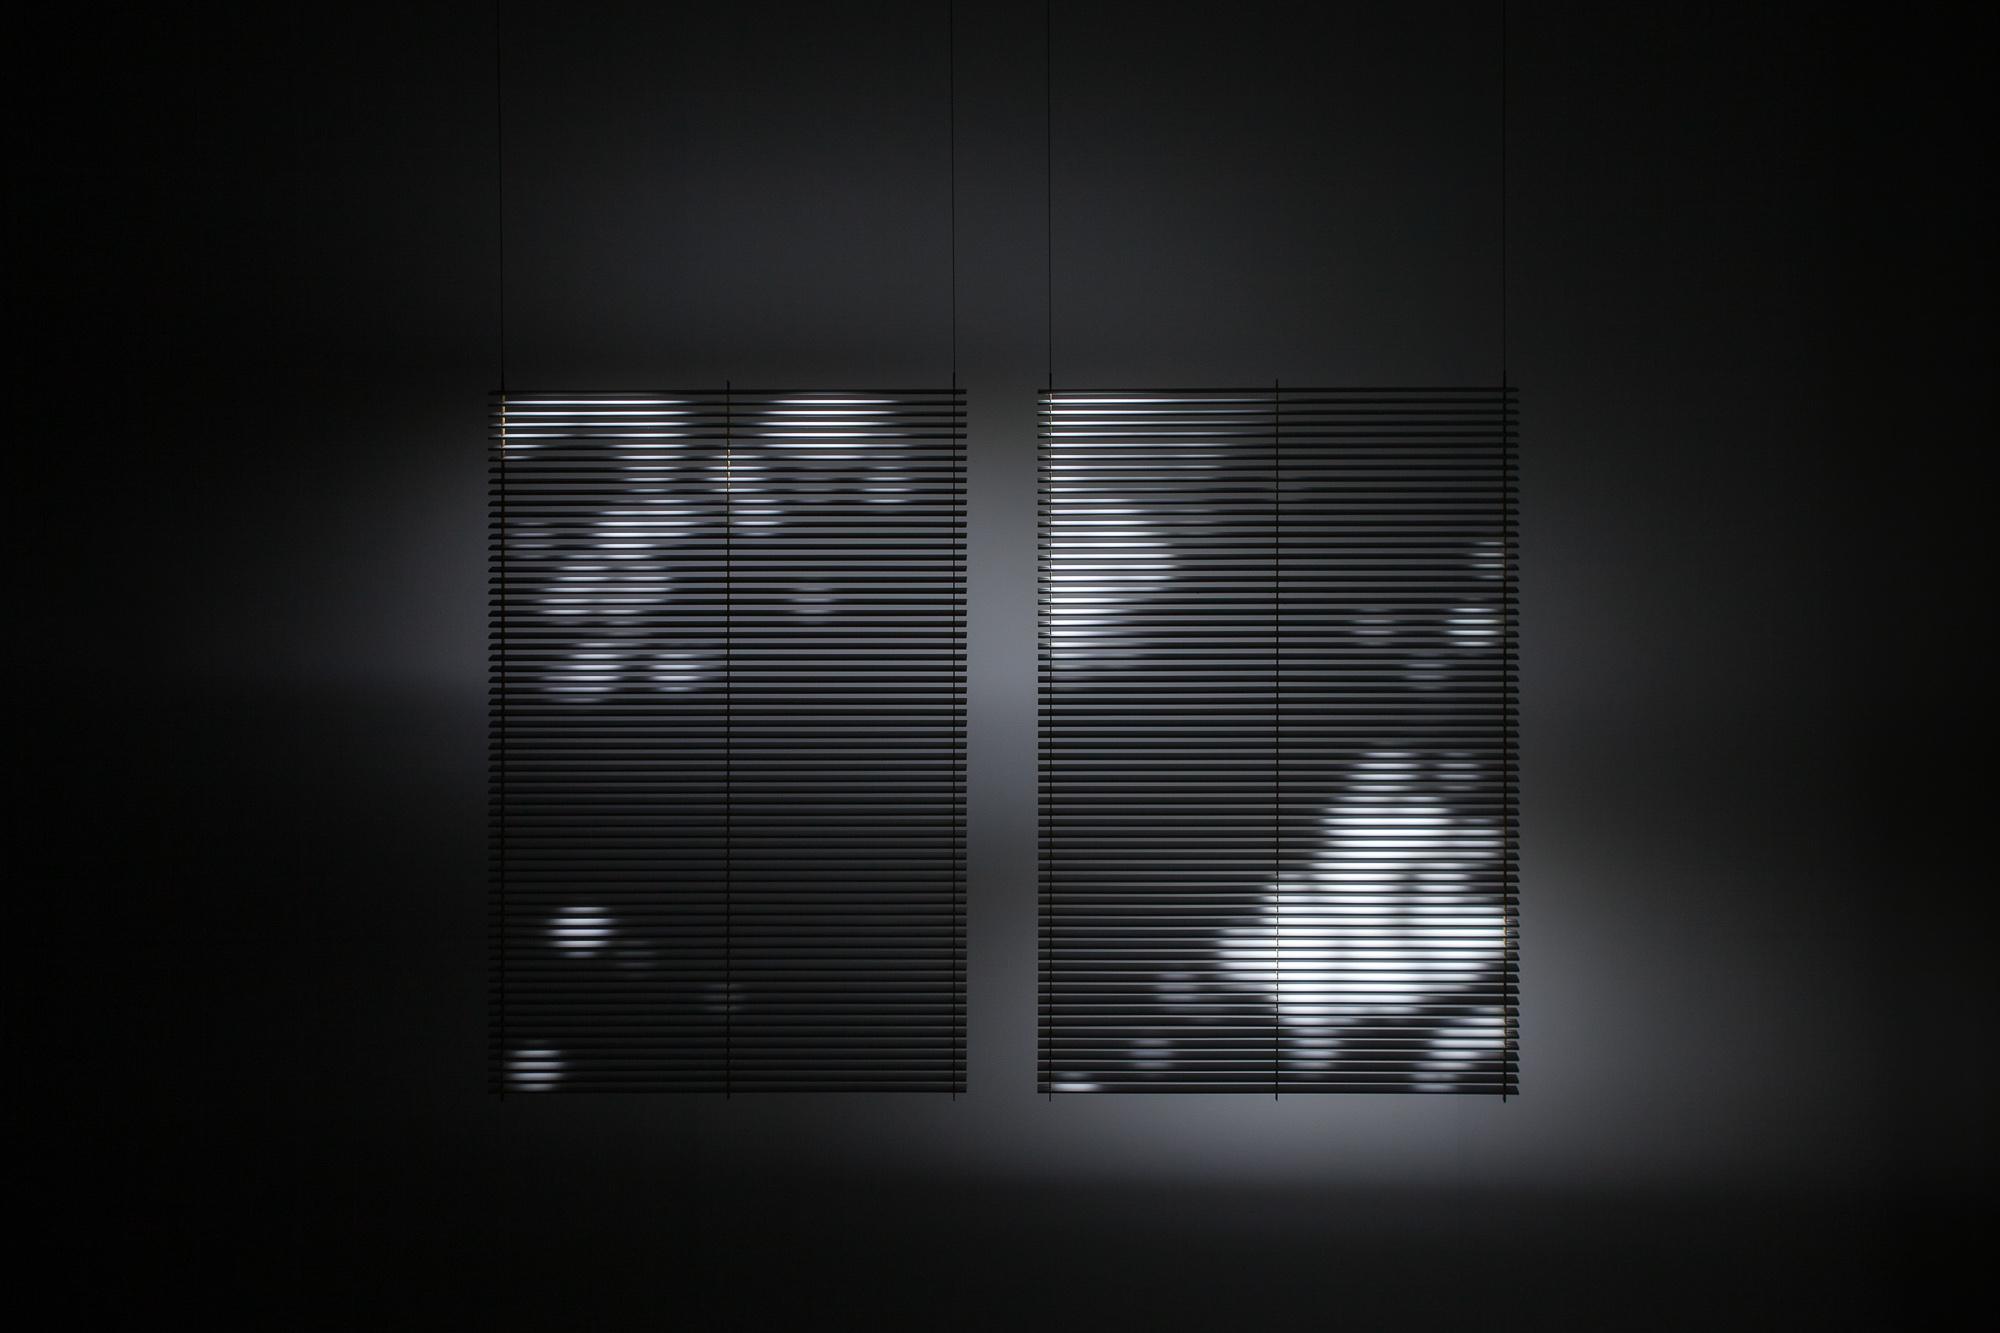 New_Dawn-5.jpg